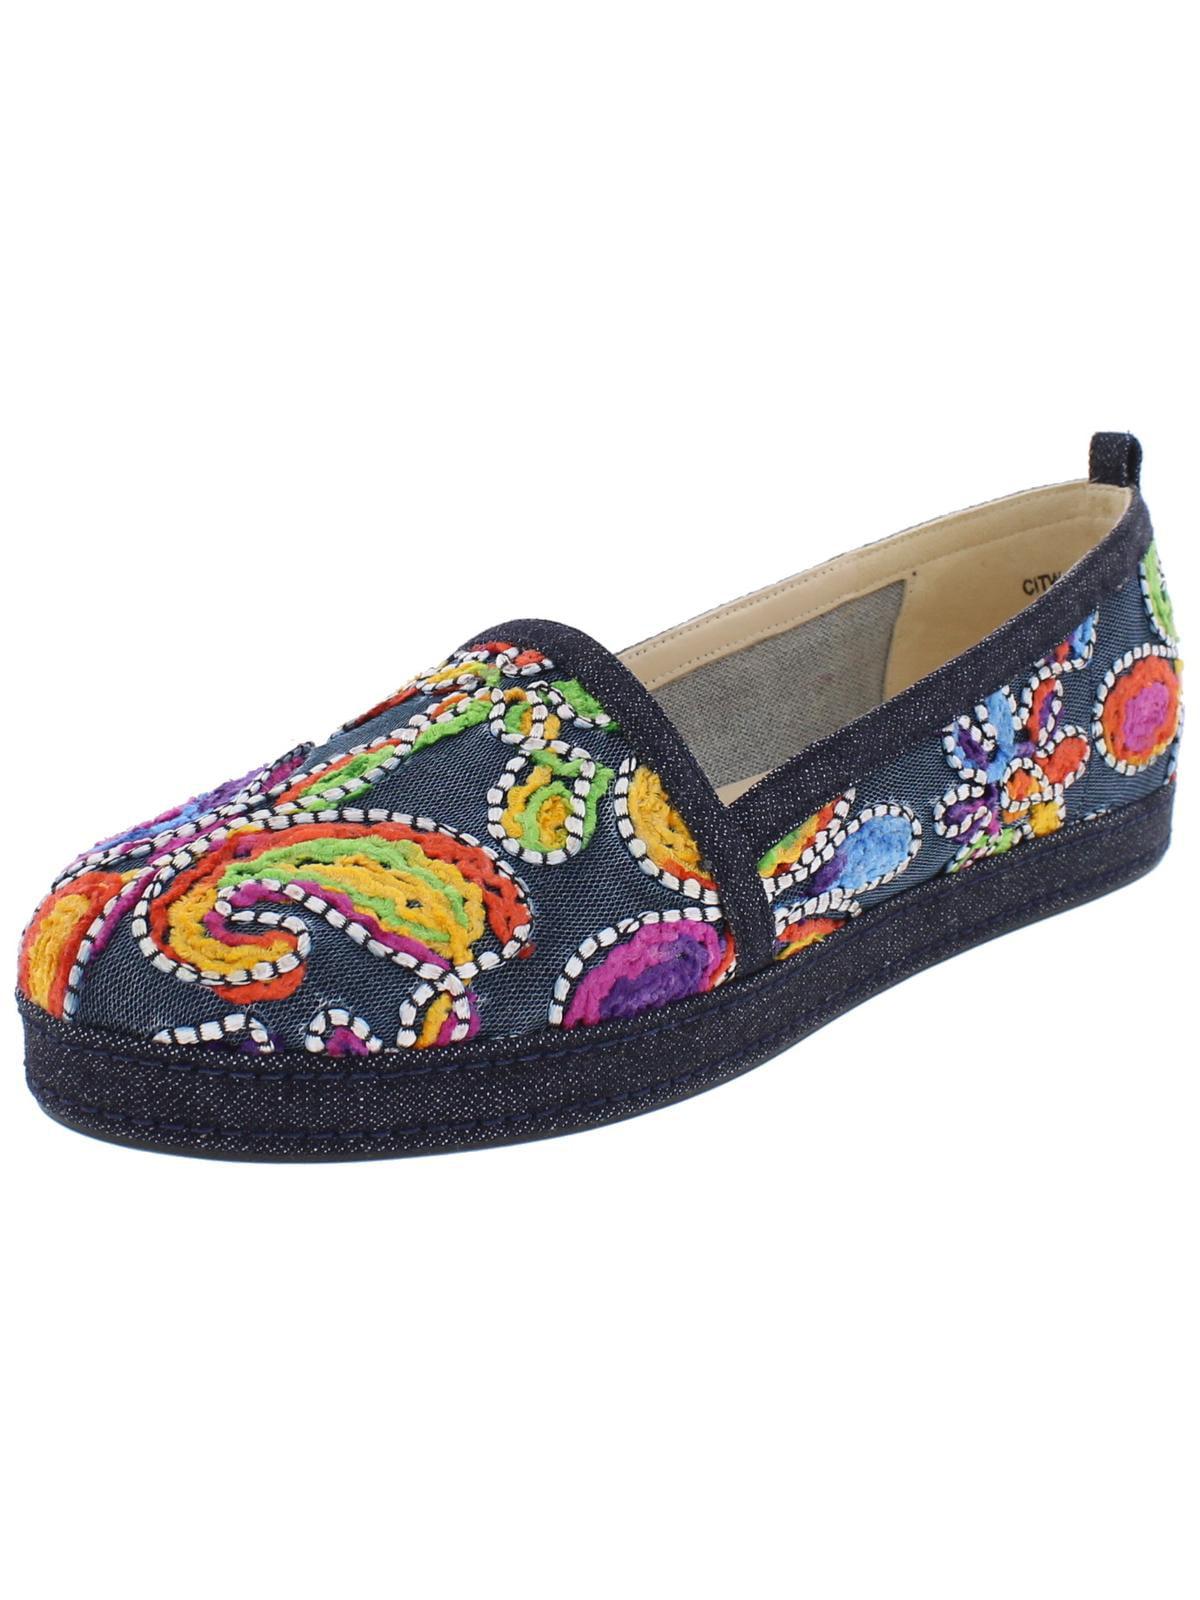 Stuart Weitzman Womens Womens Womens Sugar Embroidered Round Toe Espadrilles 2ff0c2